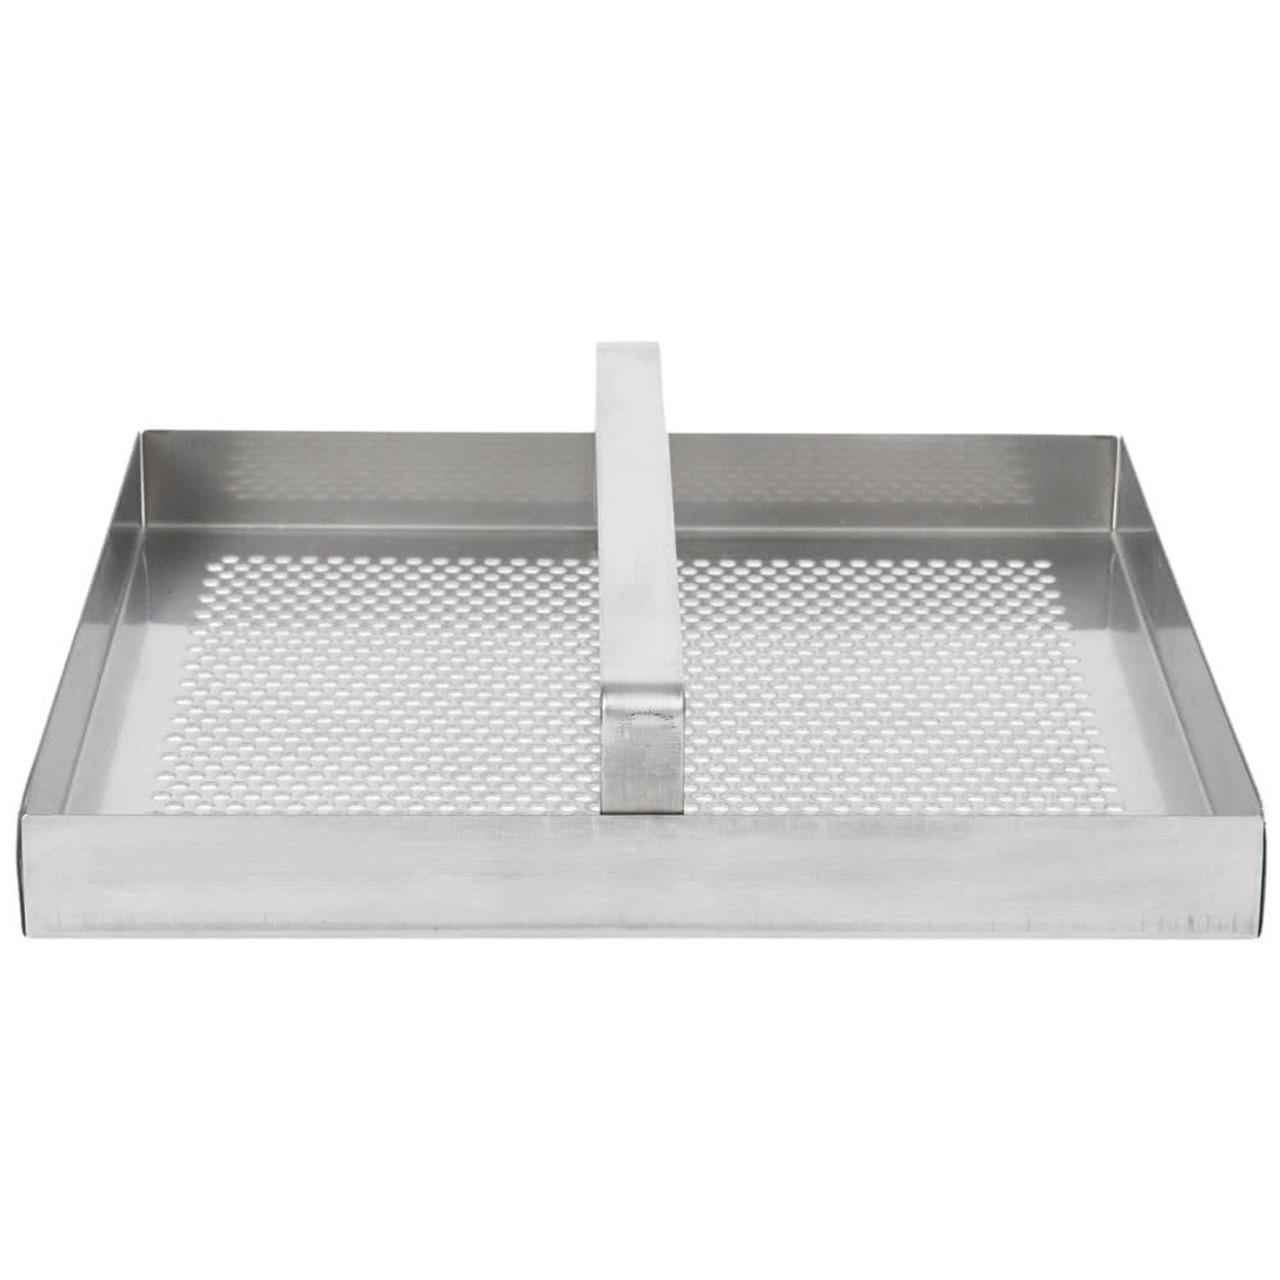 "Stainless Steel Floor Sink Strainer with 3/4"" Lip - 7 3/4"" x 7 3/4"""